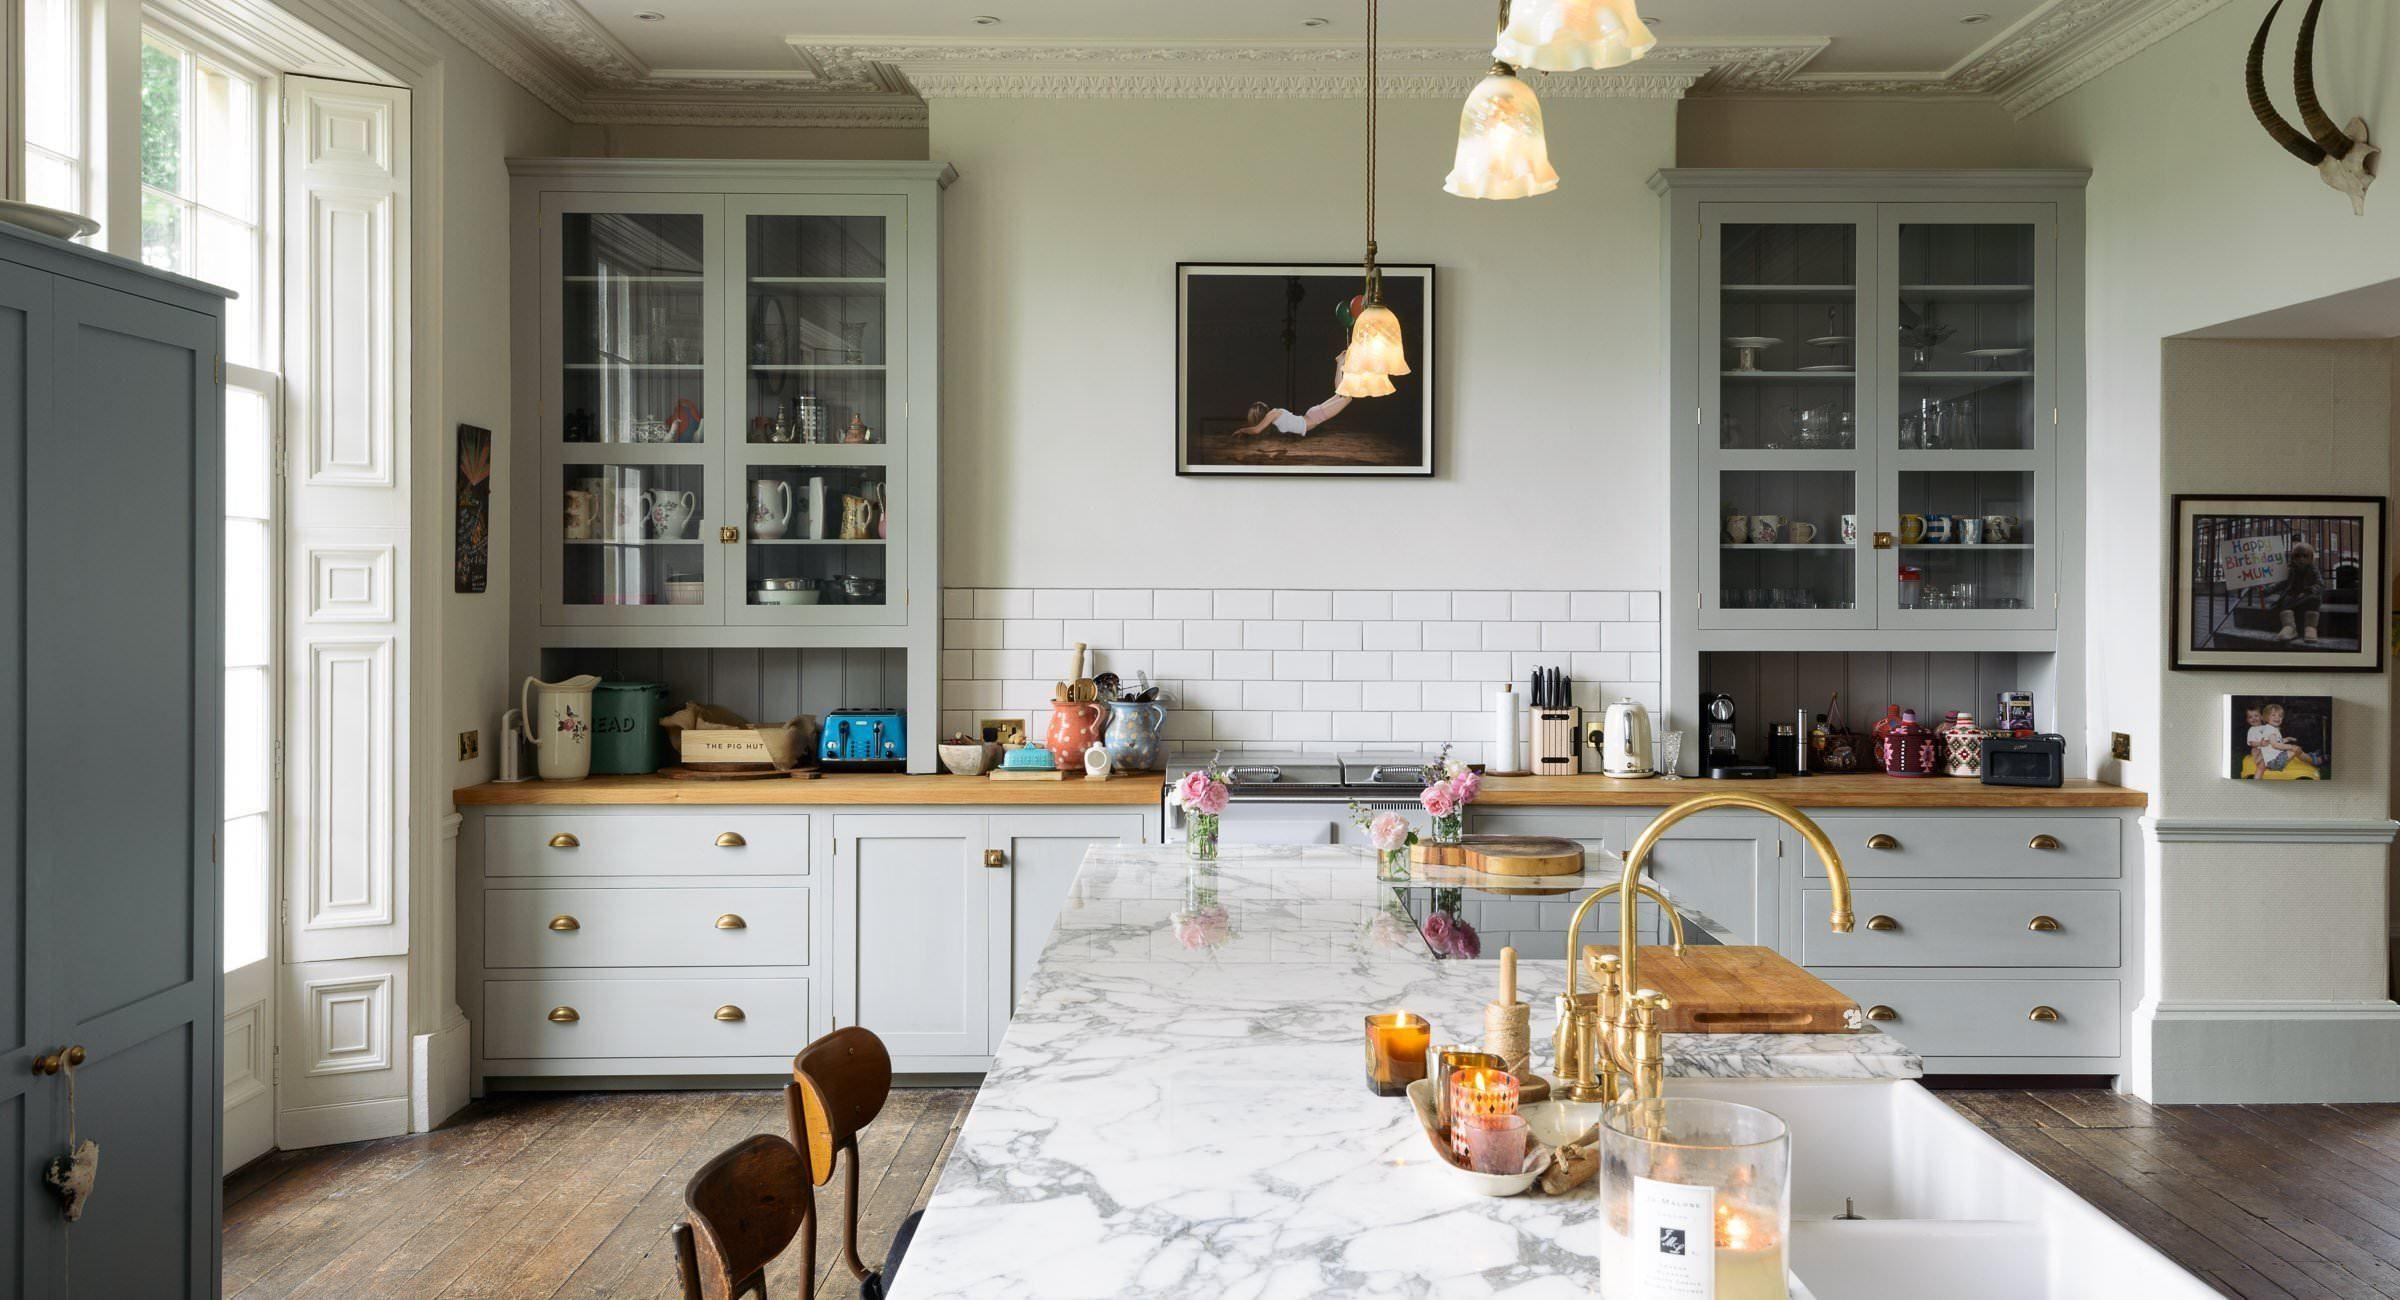 British Kitchen Inspiration And My Inset Cabinet Infatuation Devol Kitchens Country Kitchen Designs Georgian Kitchen